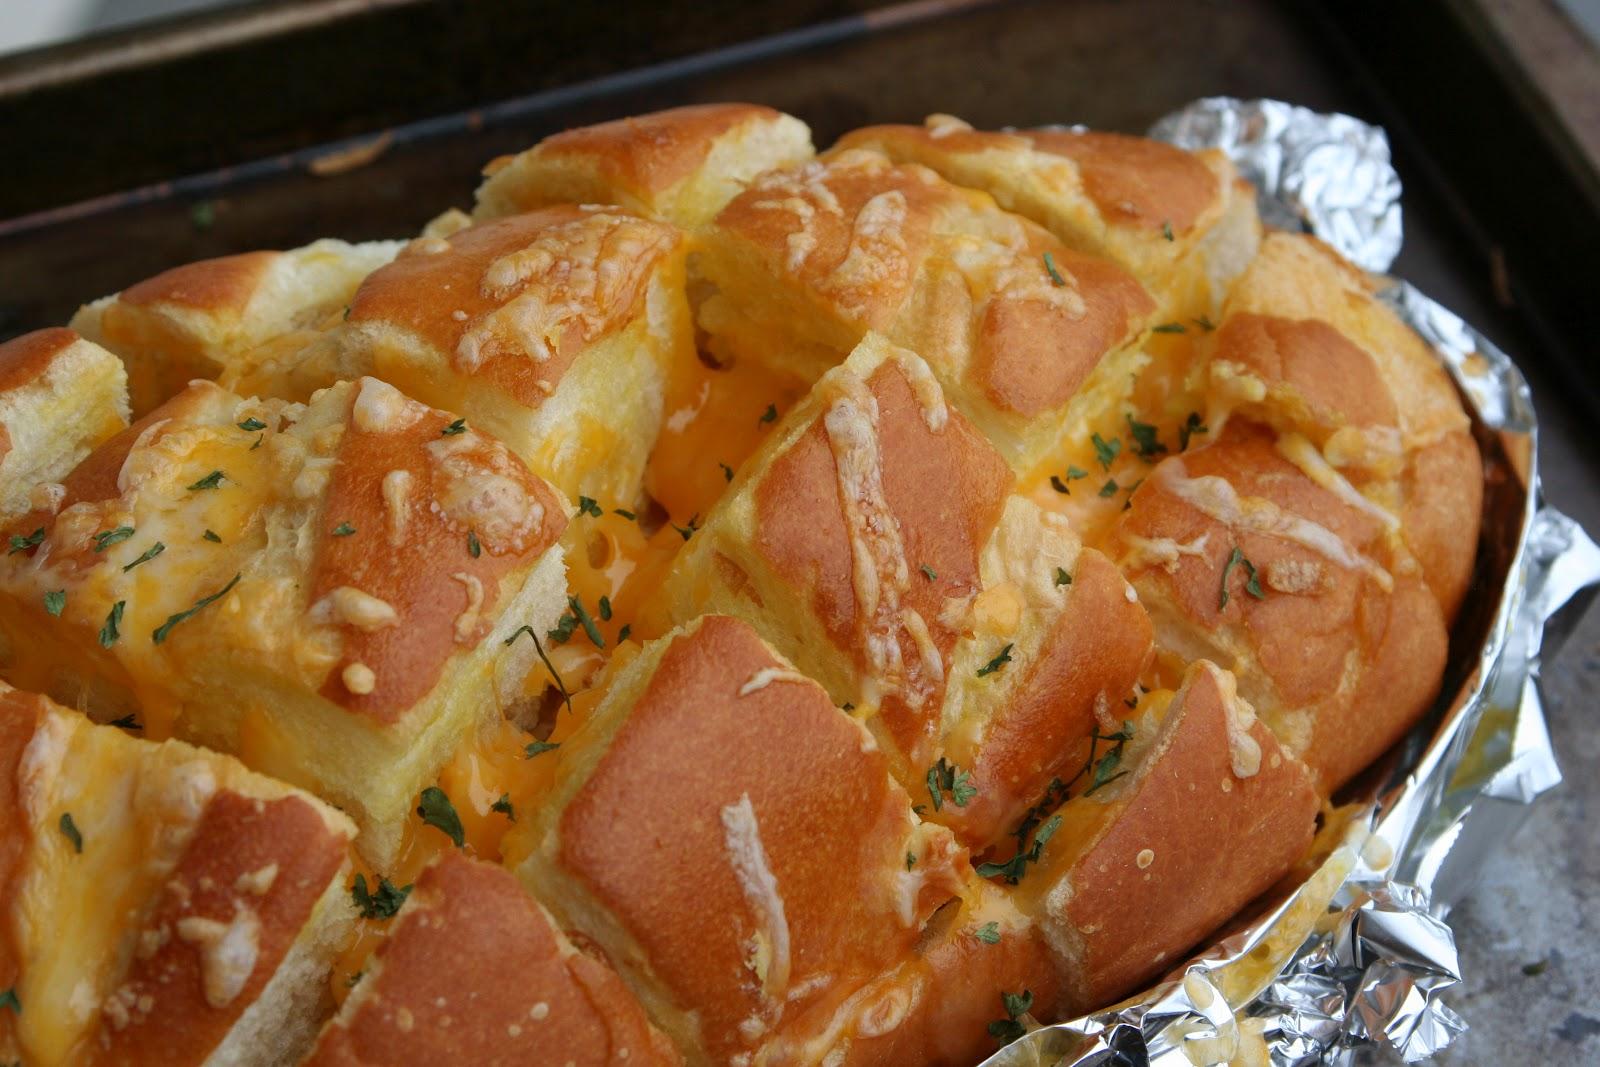 Recipe Shoebox: Stuffed French Bread